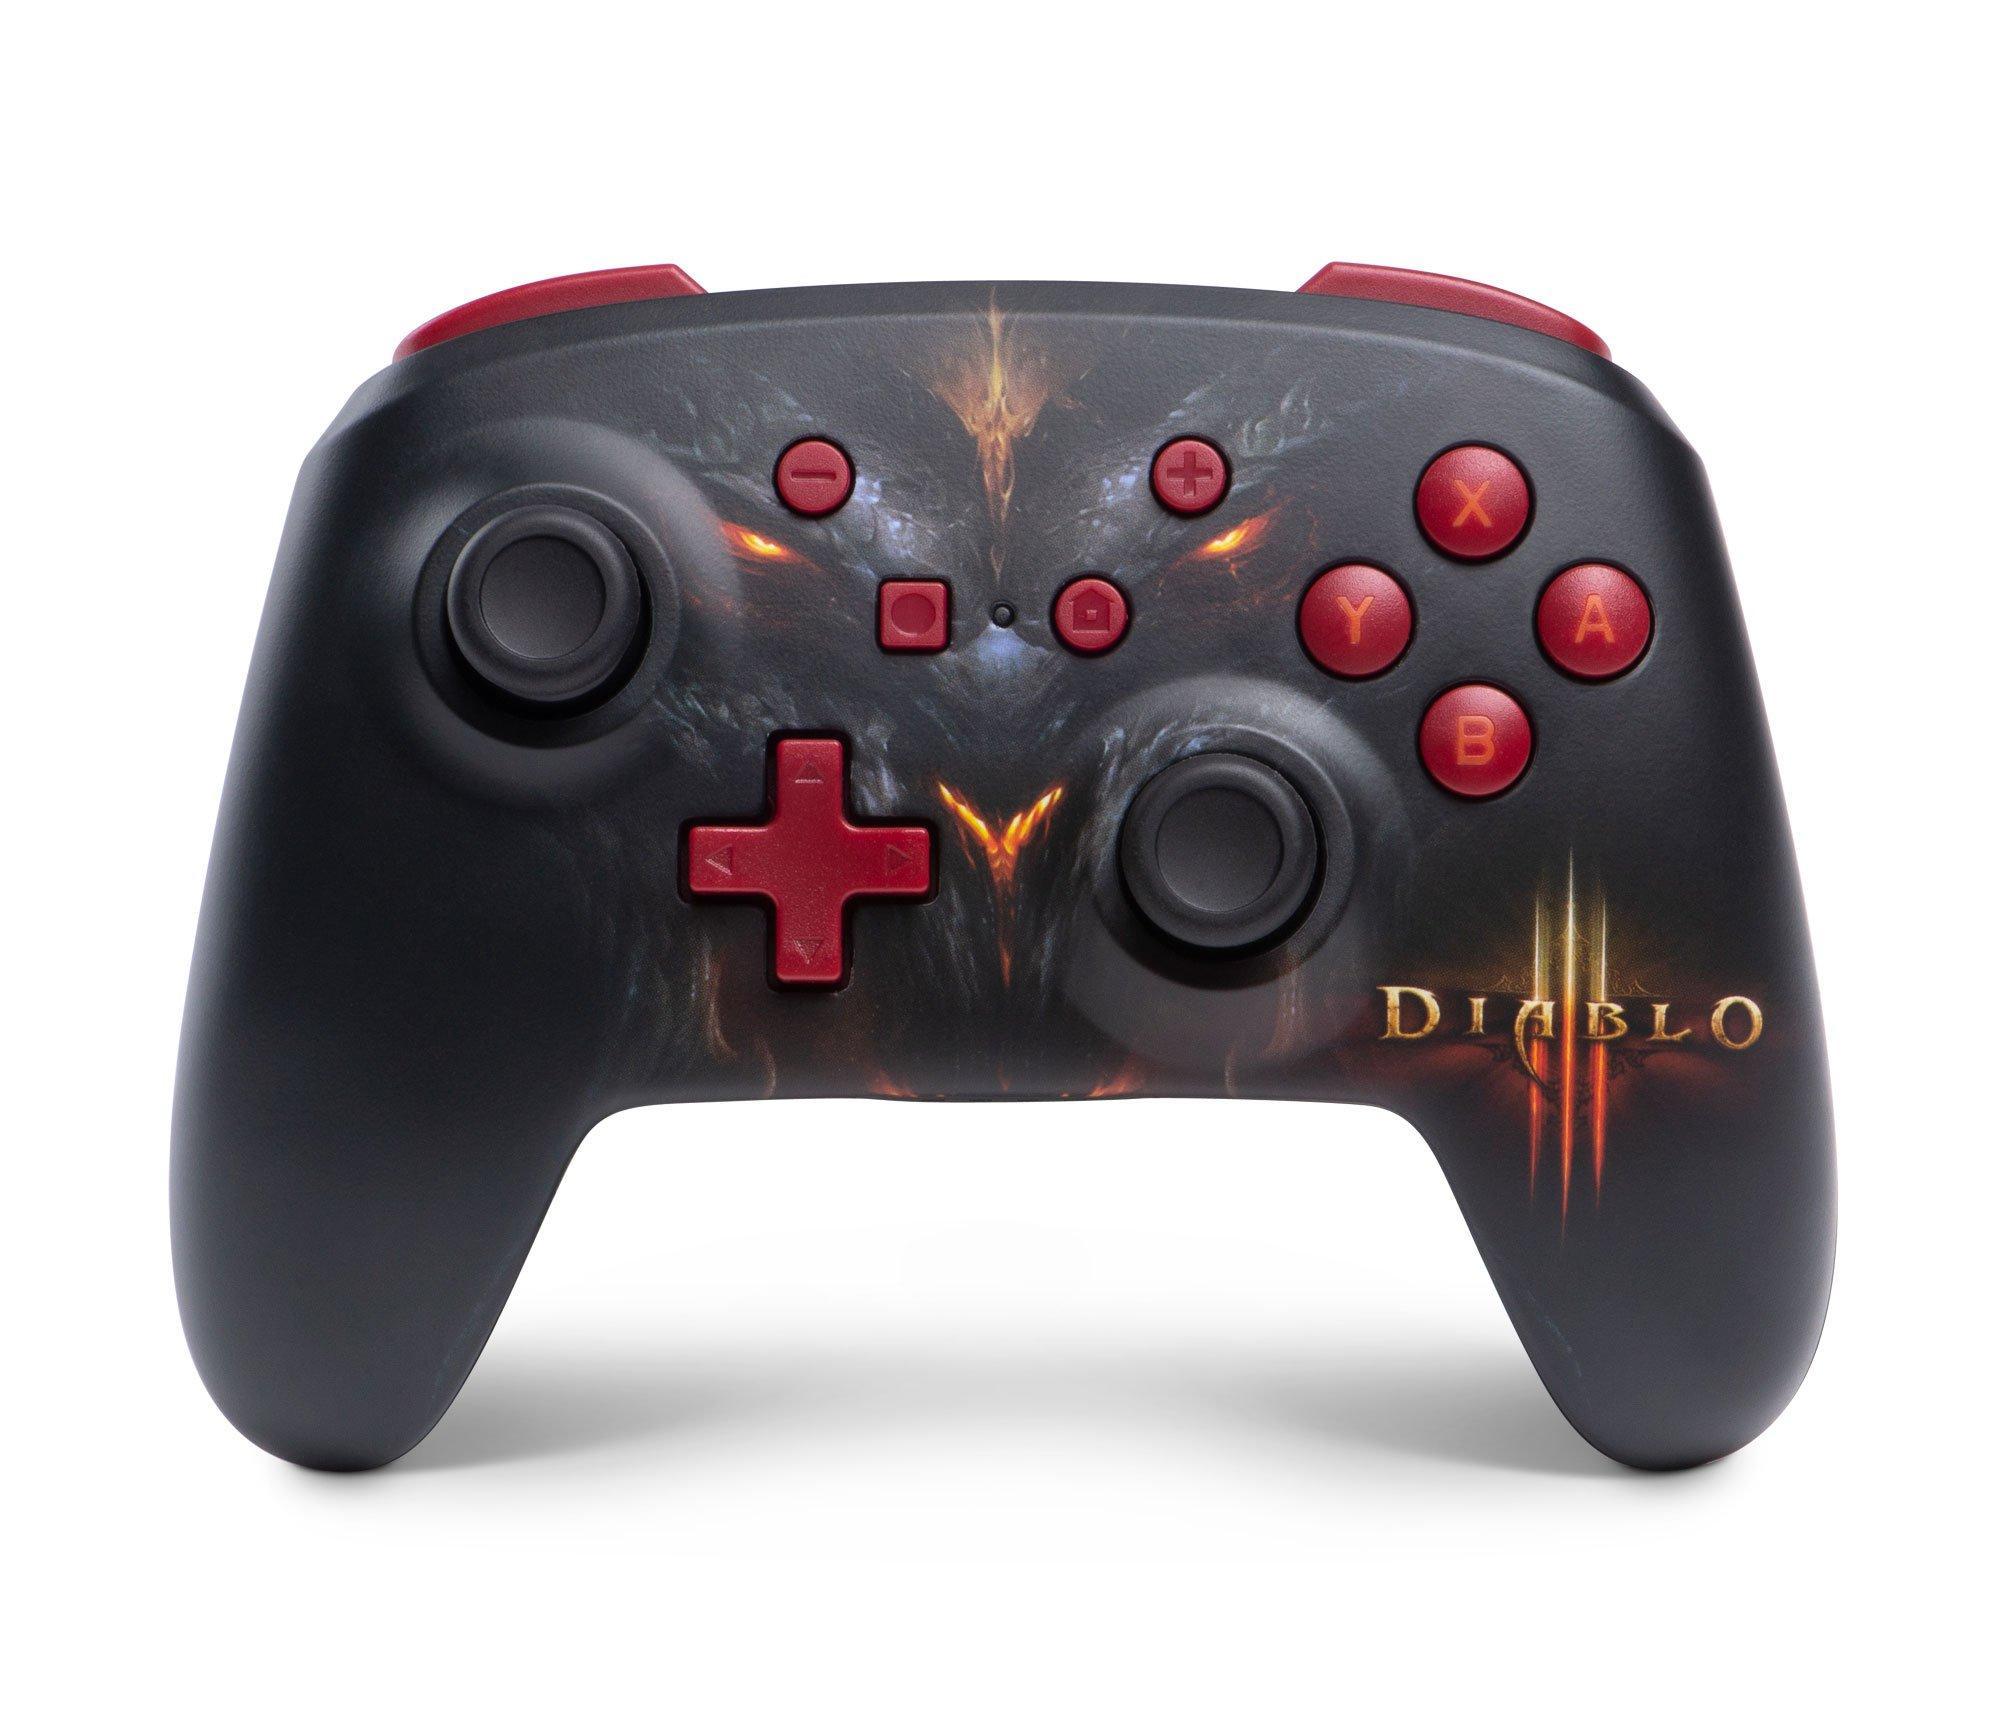 Diablo Iii Enhanced Wireless Controller For Nintendo Switch Only At Gamestop Nintendo Switch Gamestop